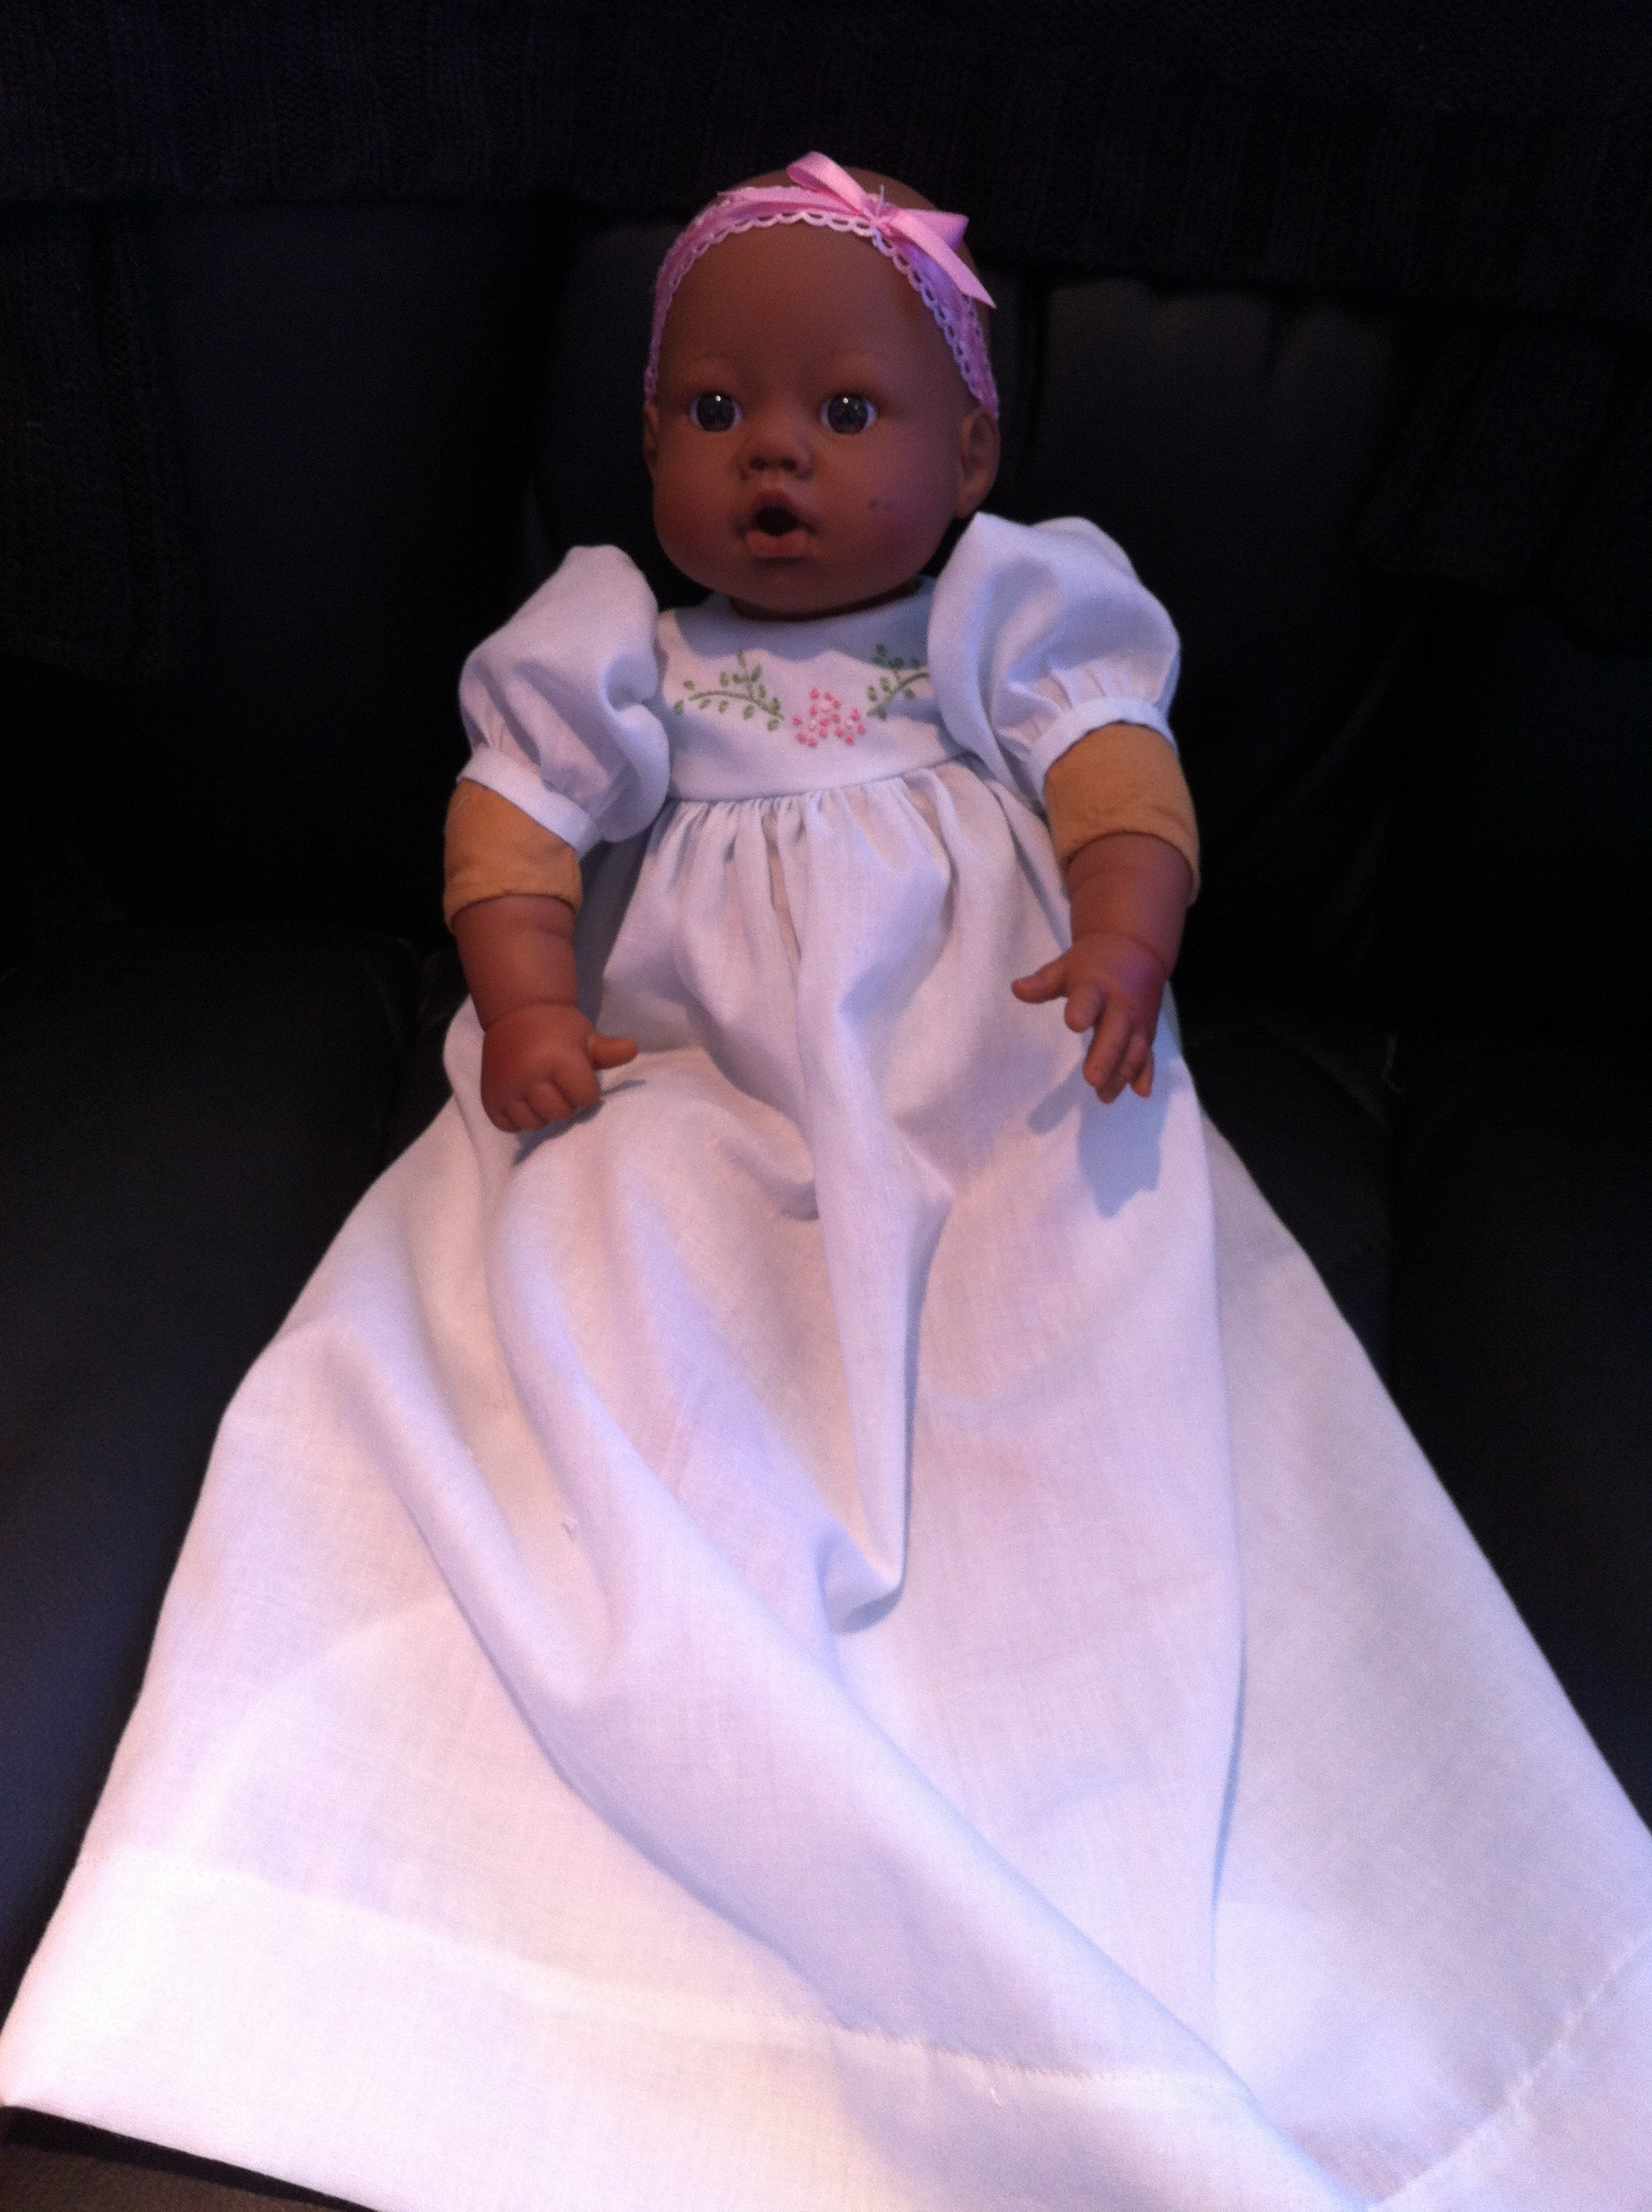 Preemie Gowns   DeborahFillmer.com